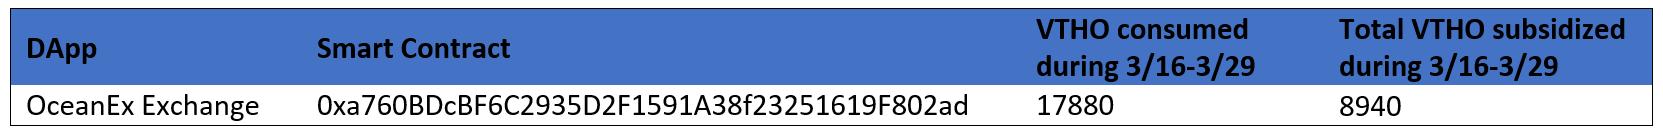 b5f096b9-5343-4aaf-8aca-7028f031afcd-image.png